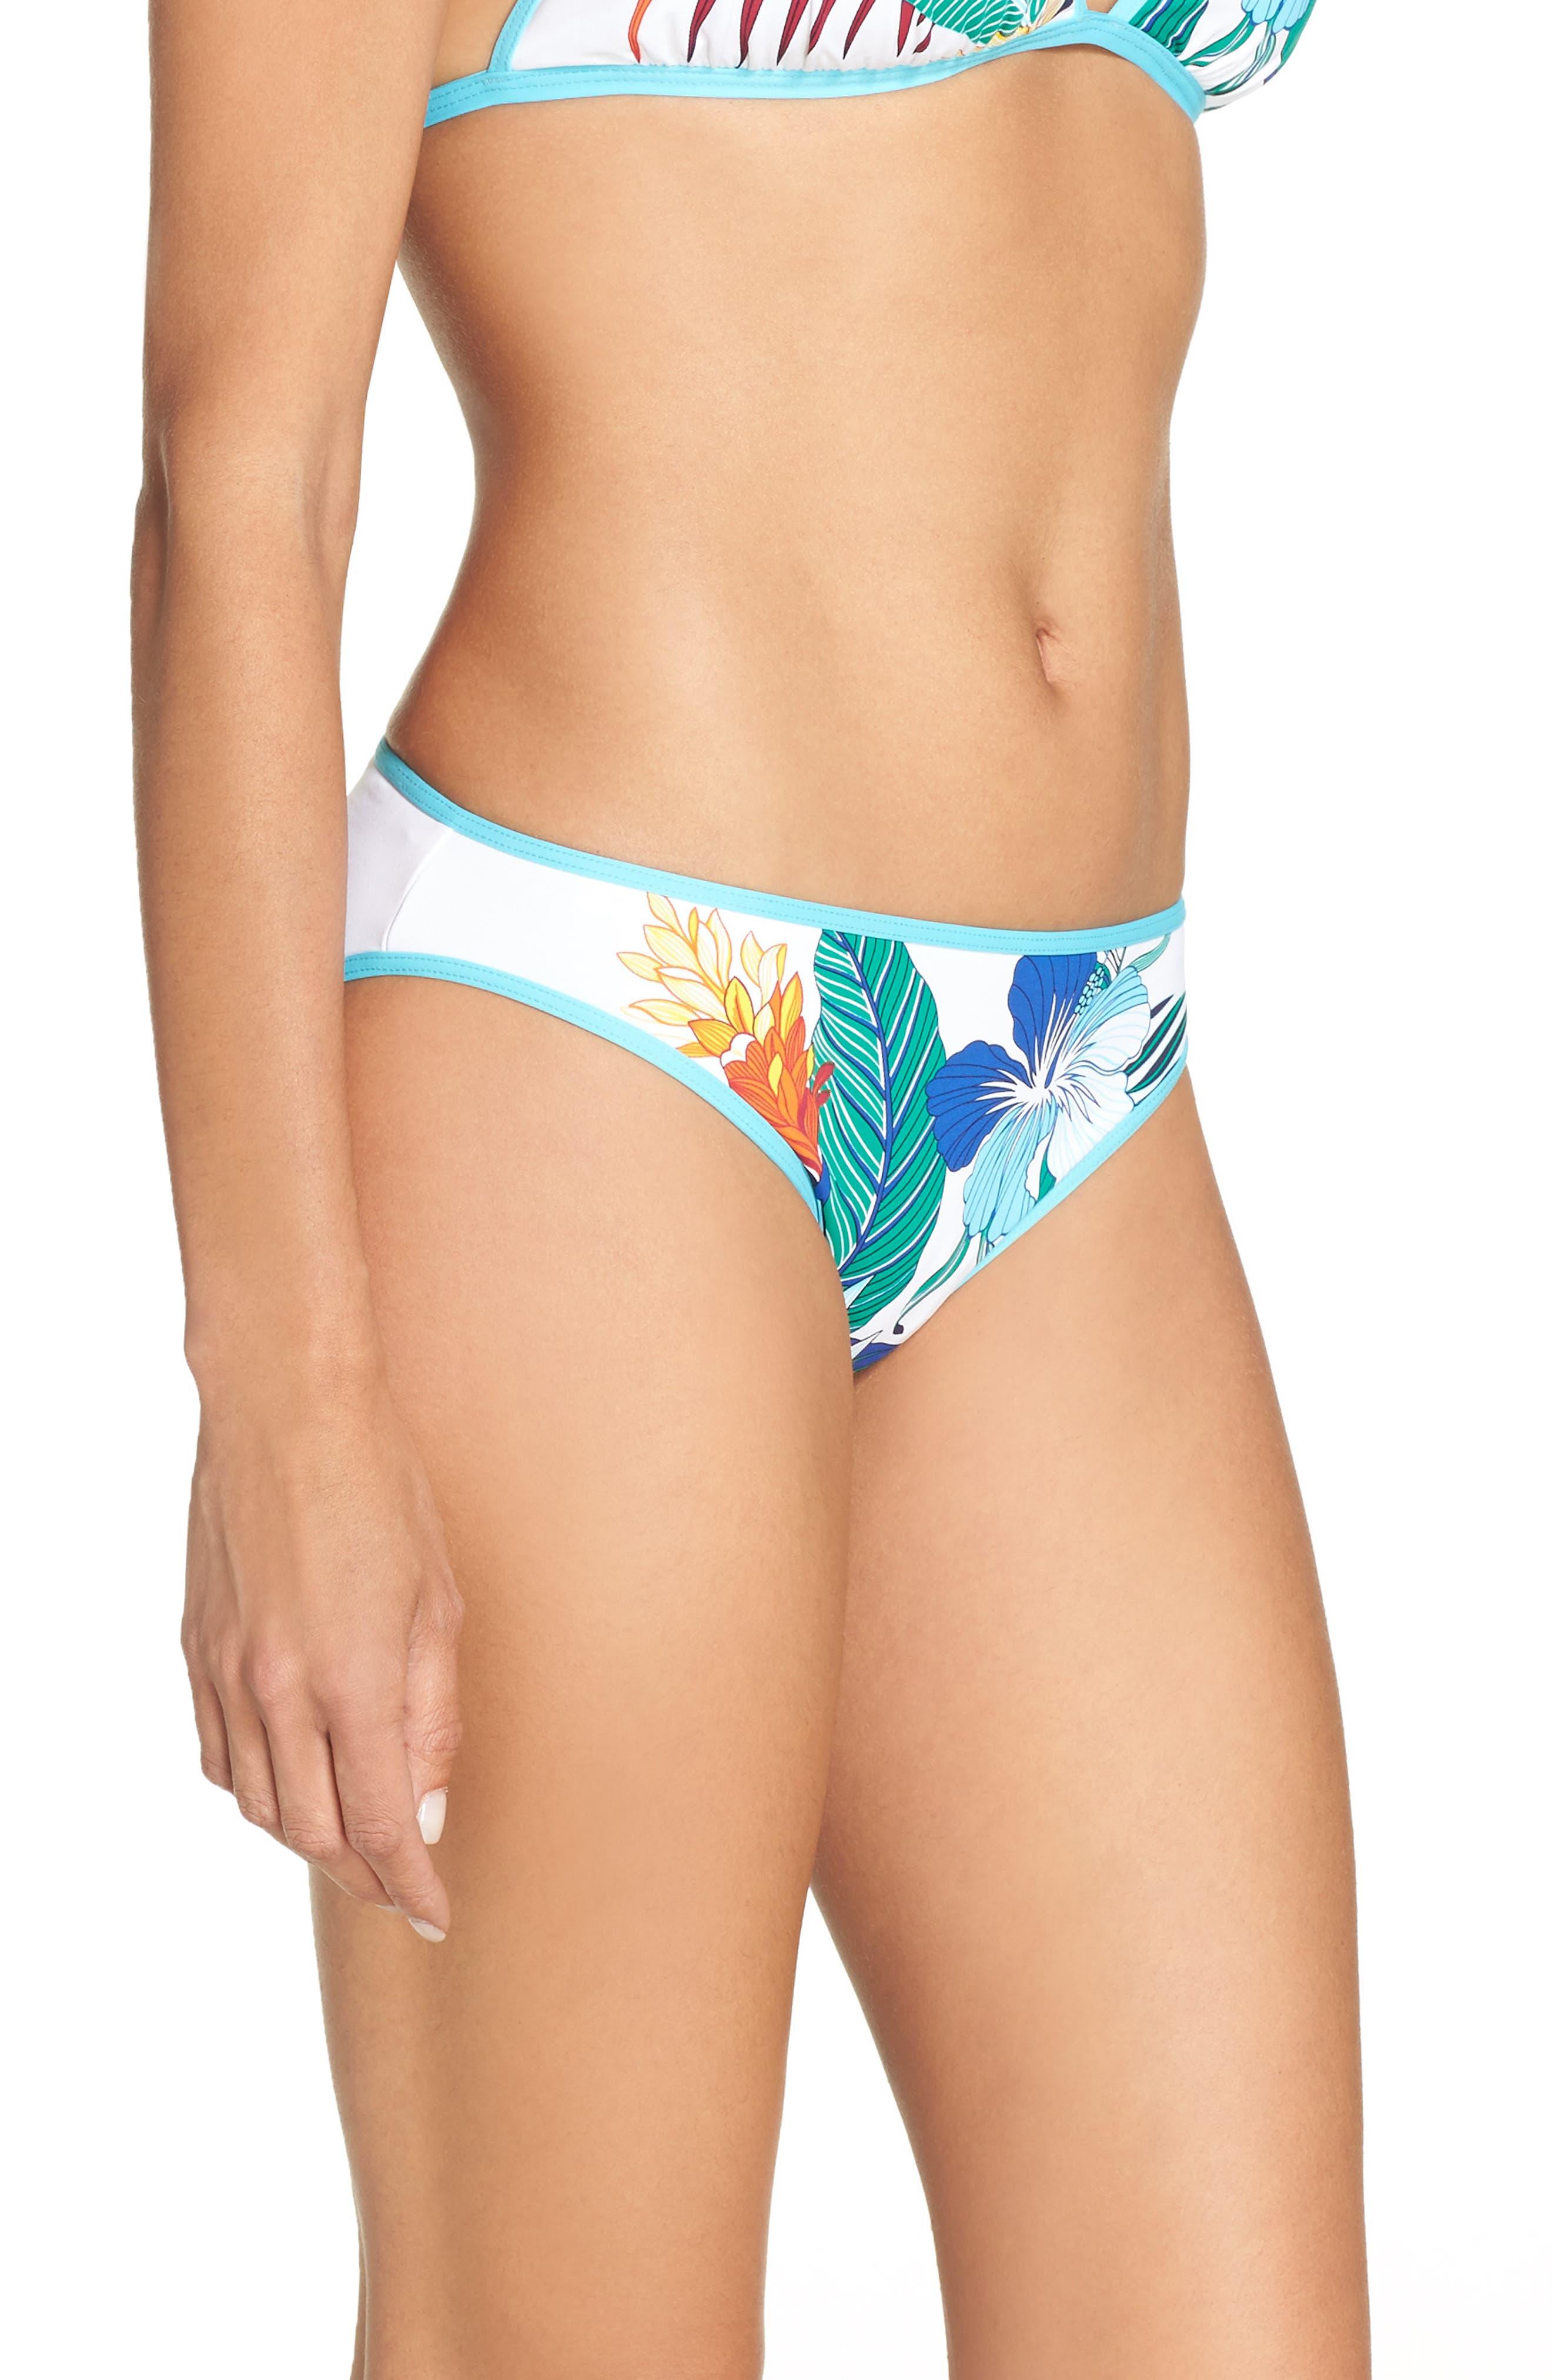 Hibiscus Print Bikini Bottoms,                             Alternate thumbnail 3, color,                             100